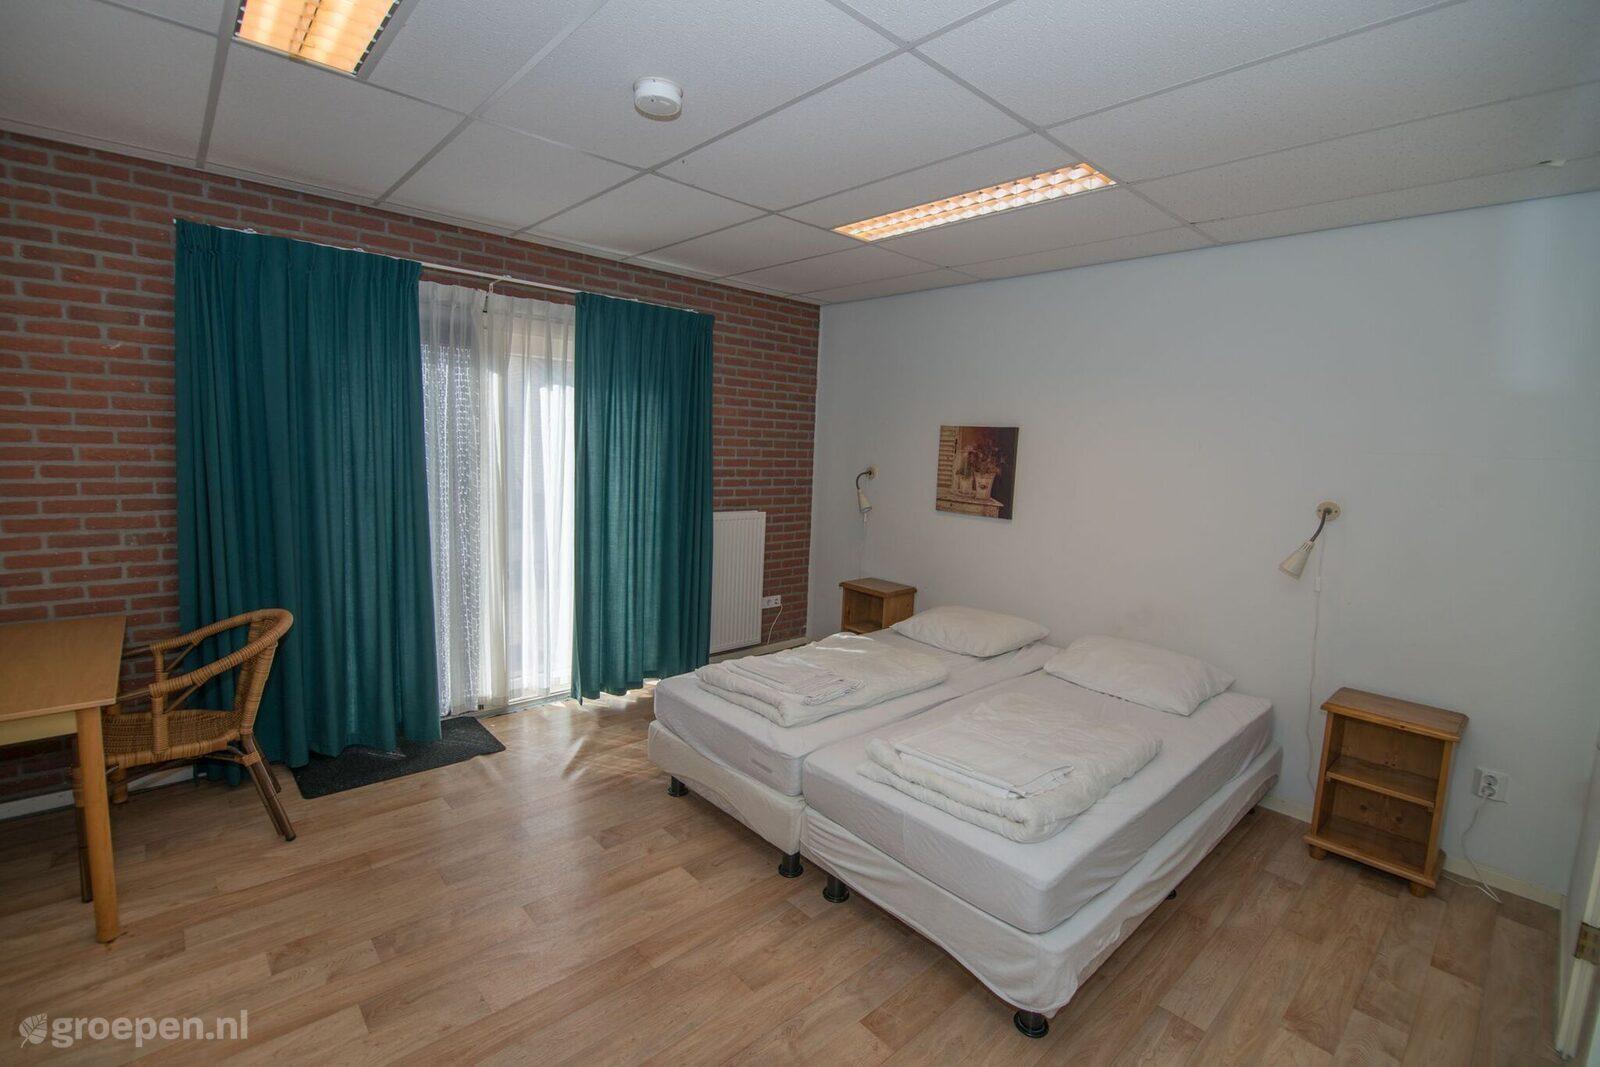 Group accommodation Den Ham